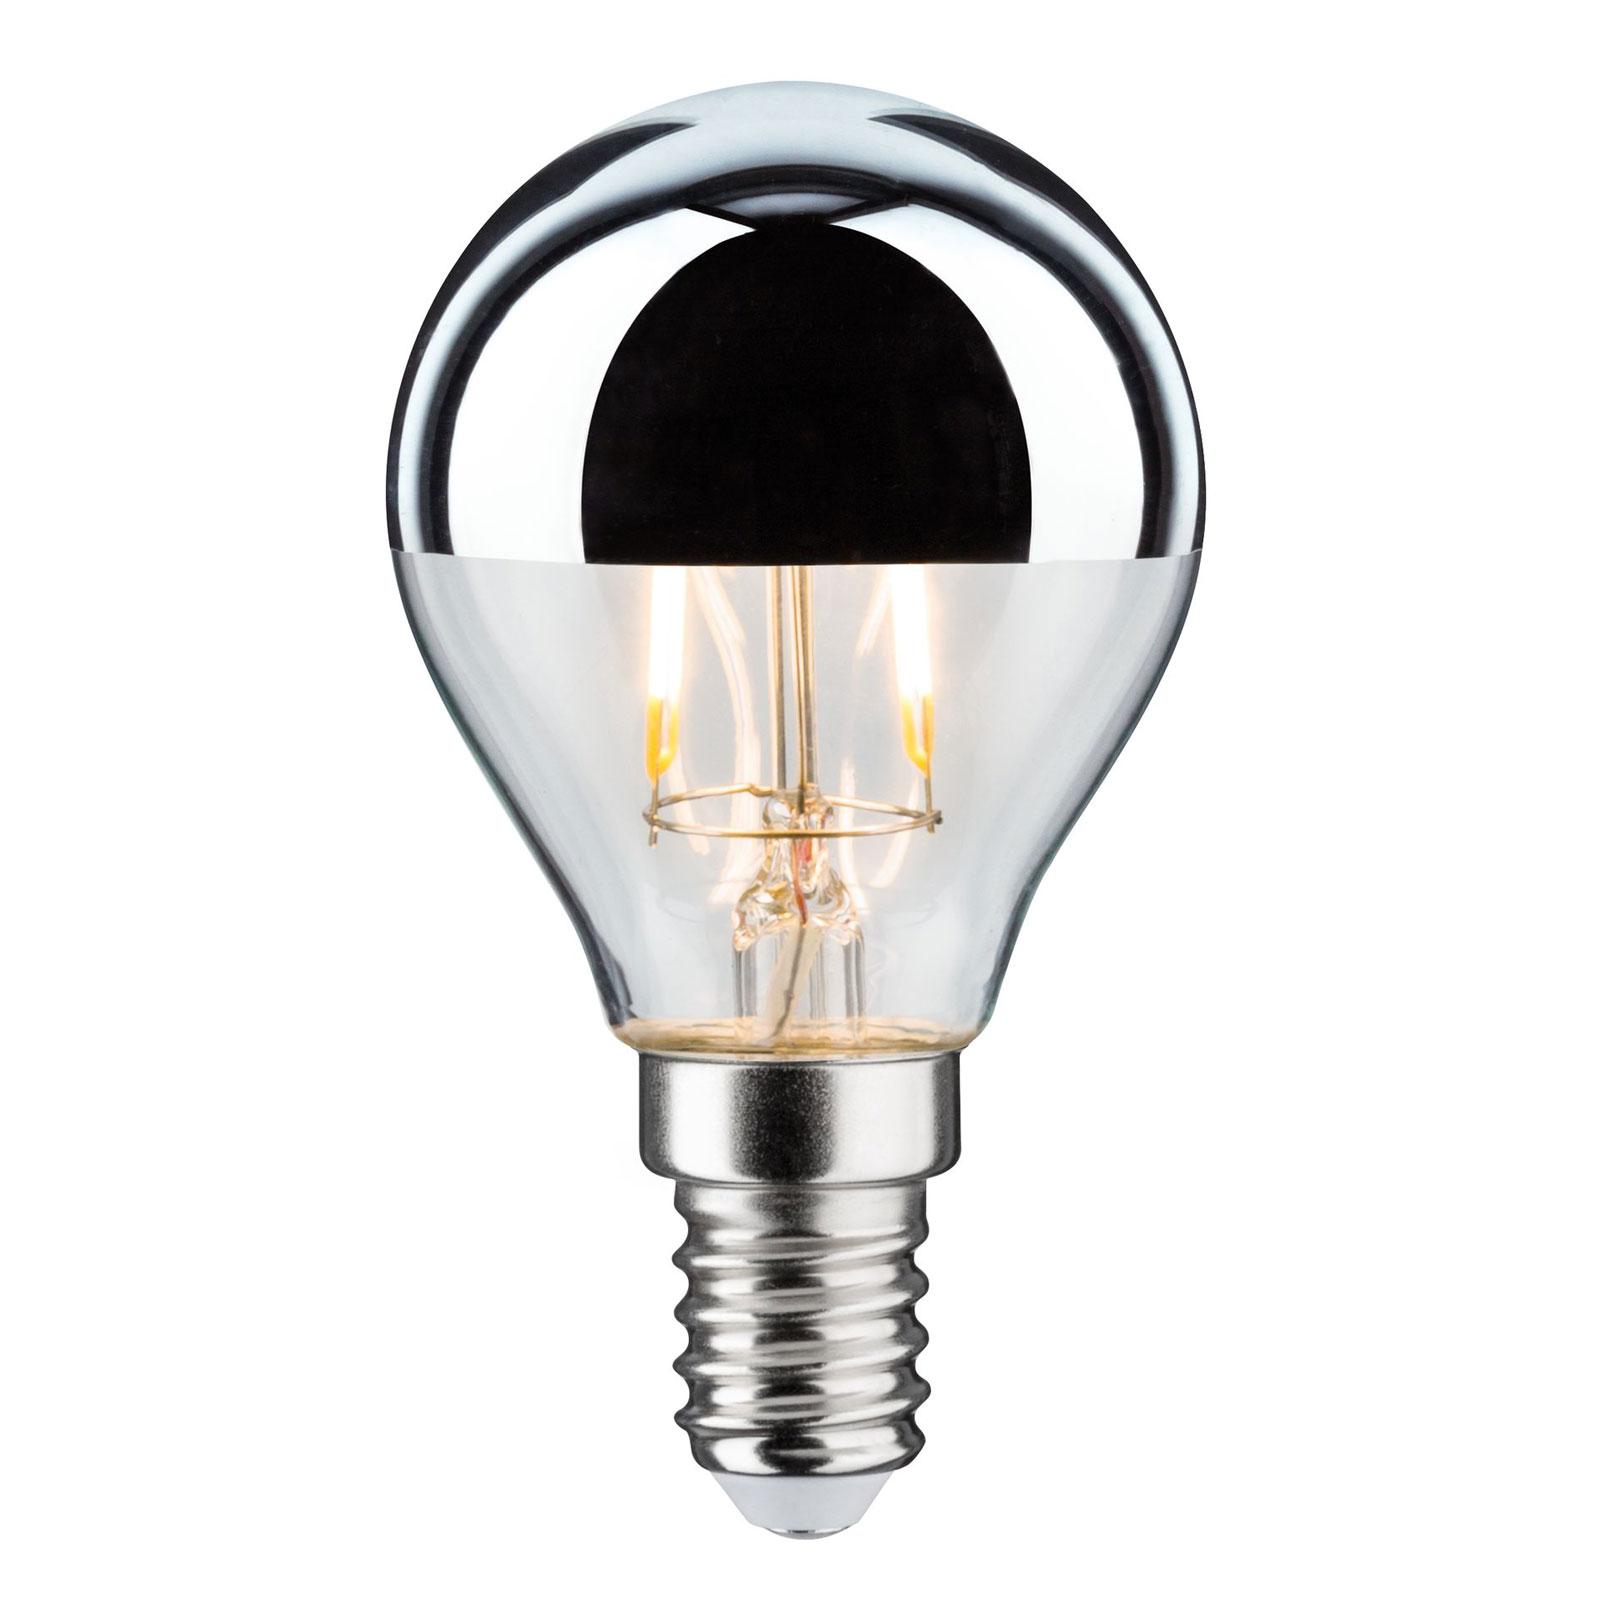 Żarówka LED E14 827 kropla lustrzana srebrna 2,6W